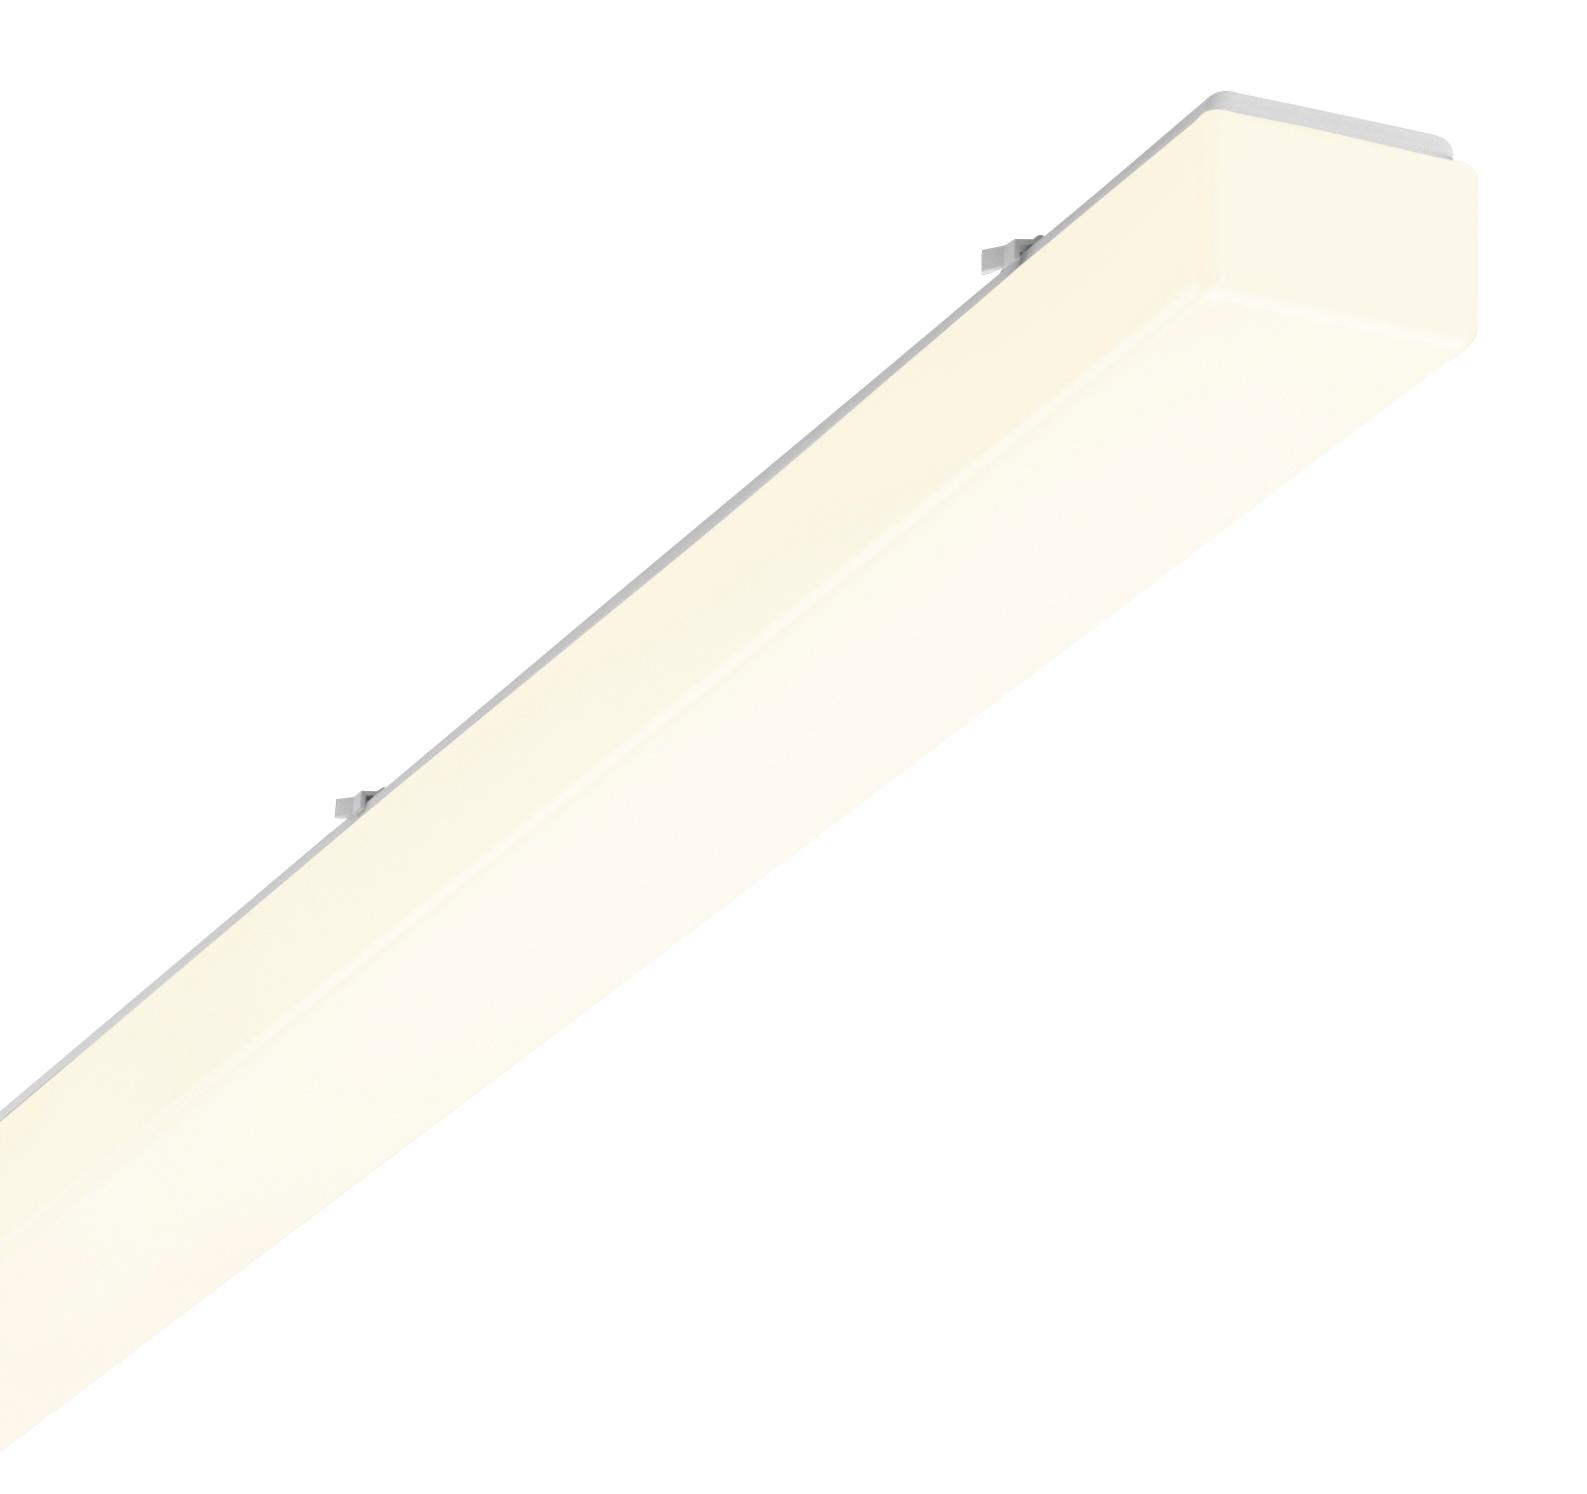 1 Stk AOT-O LED Wannenleuchte, 38W, 3000K, IP50, acryl, opal, Weiß LI70111962